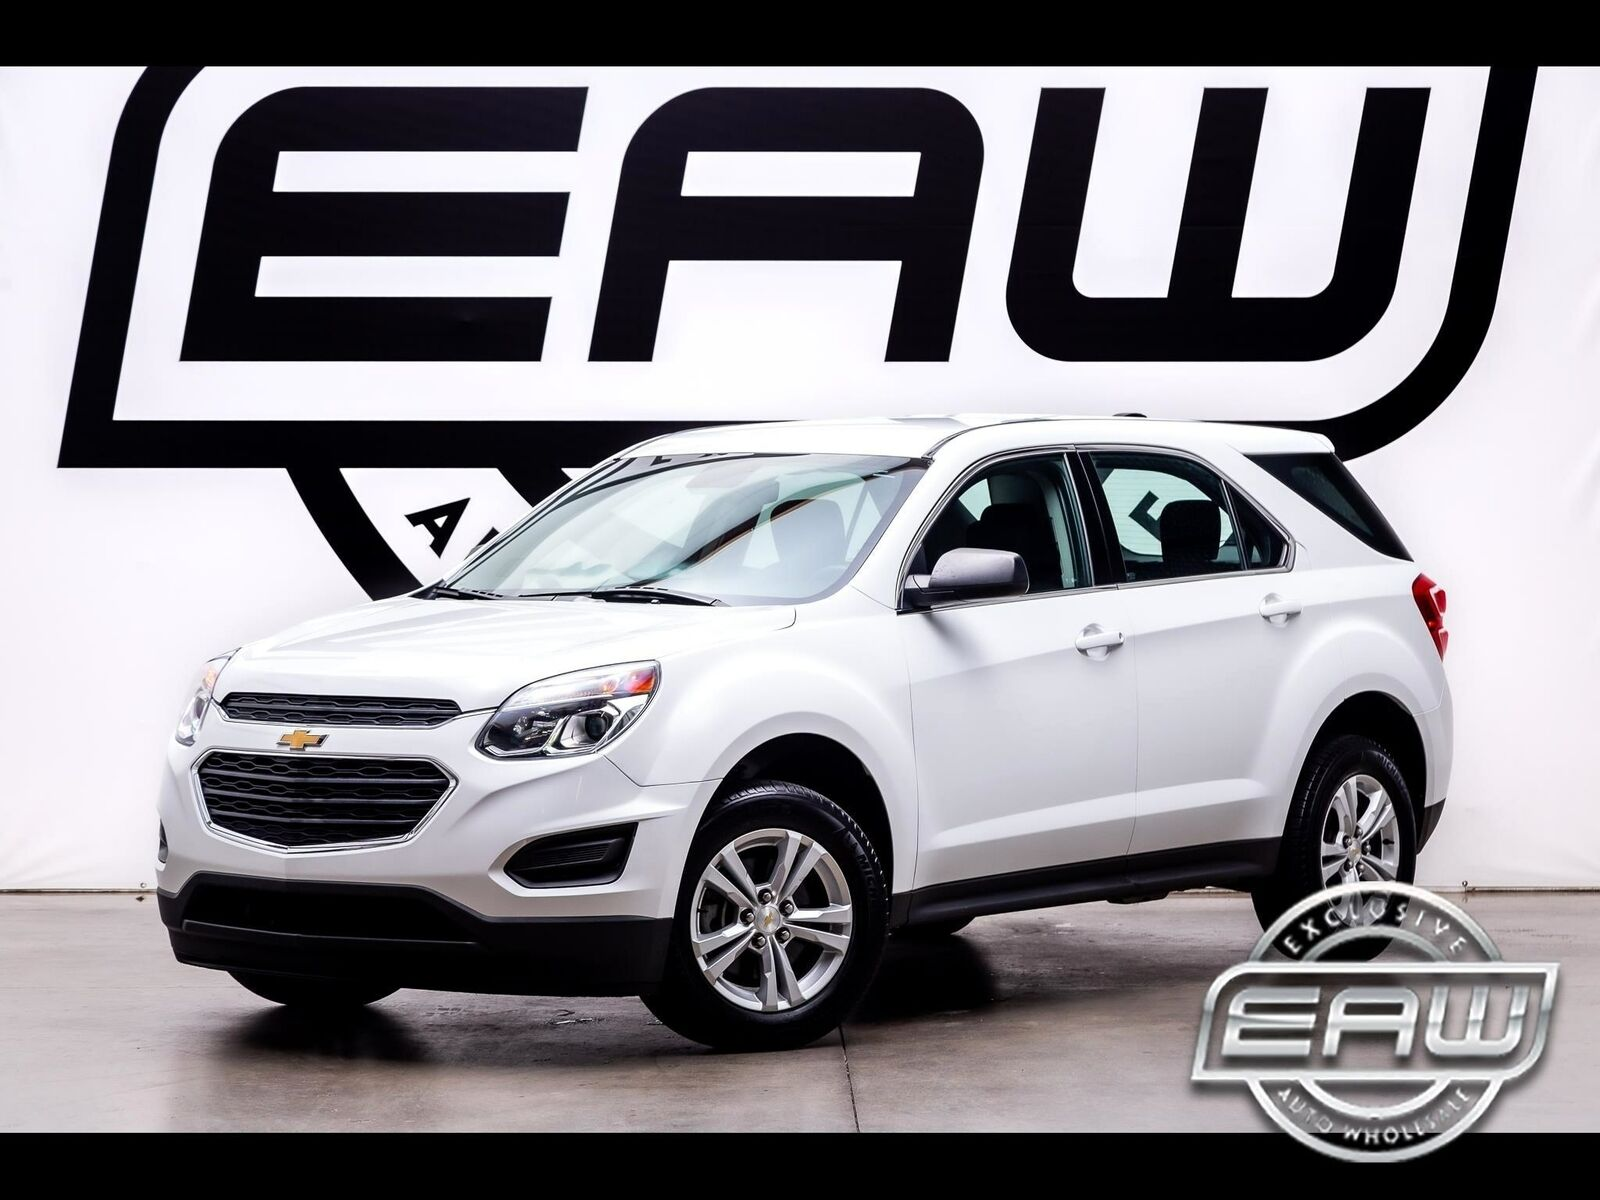 2017 Chevrolet Equinox FWD 4dr LS 55796 Miles White SUV Engine, 2.4L DOHC 4-cyli